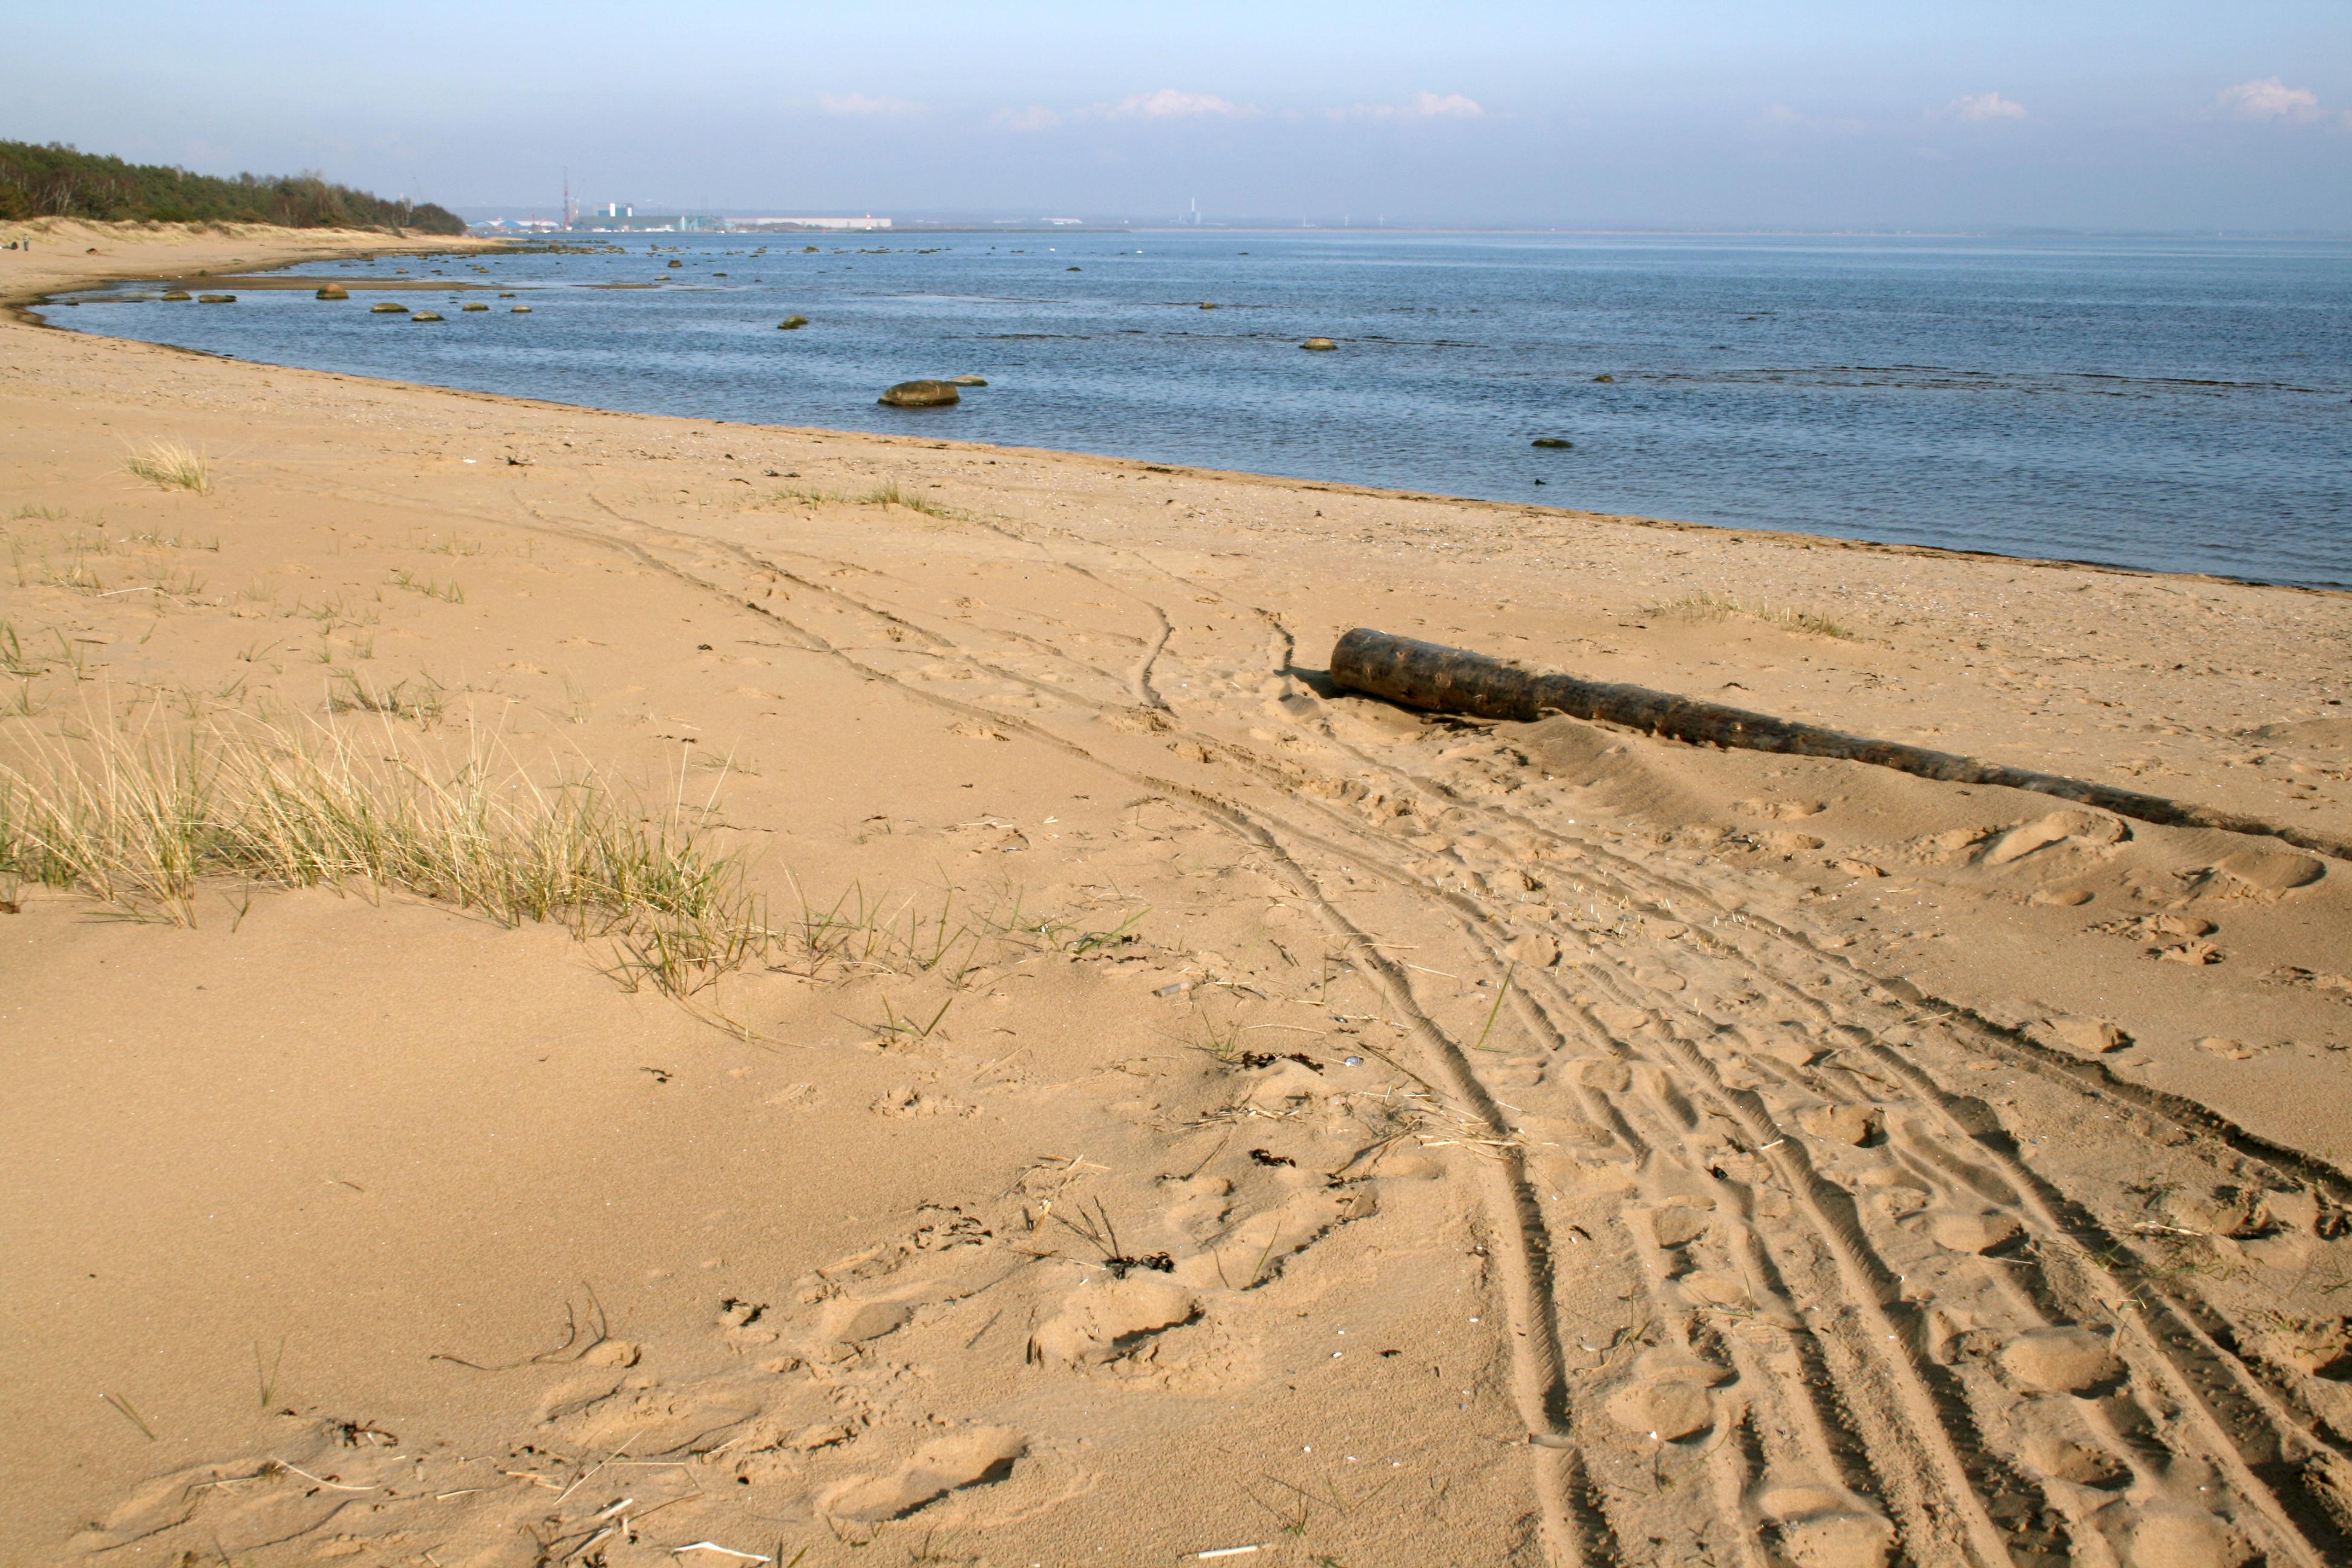 File:Beach in Halmstad.jpg - Wikimedia Commons